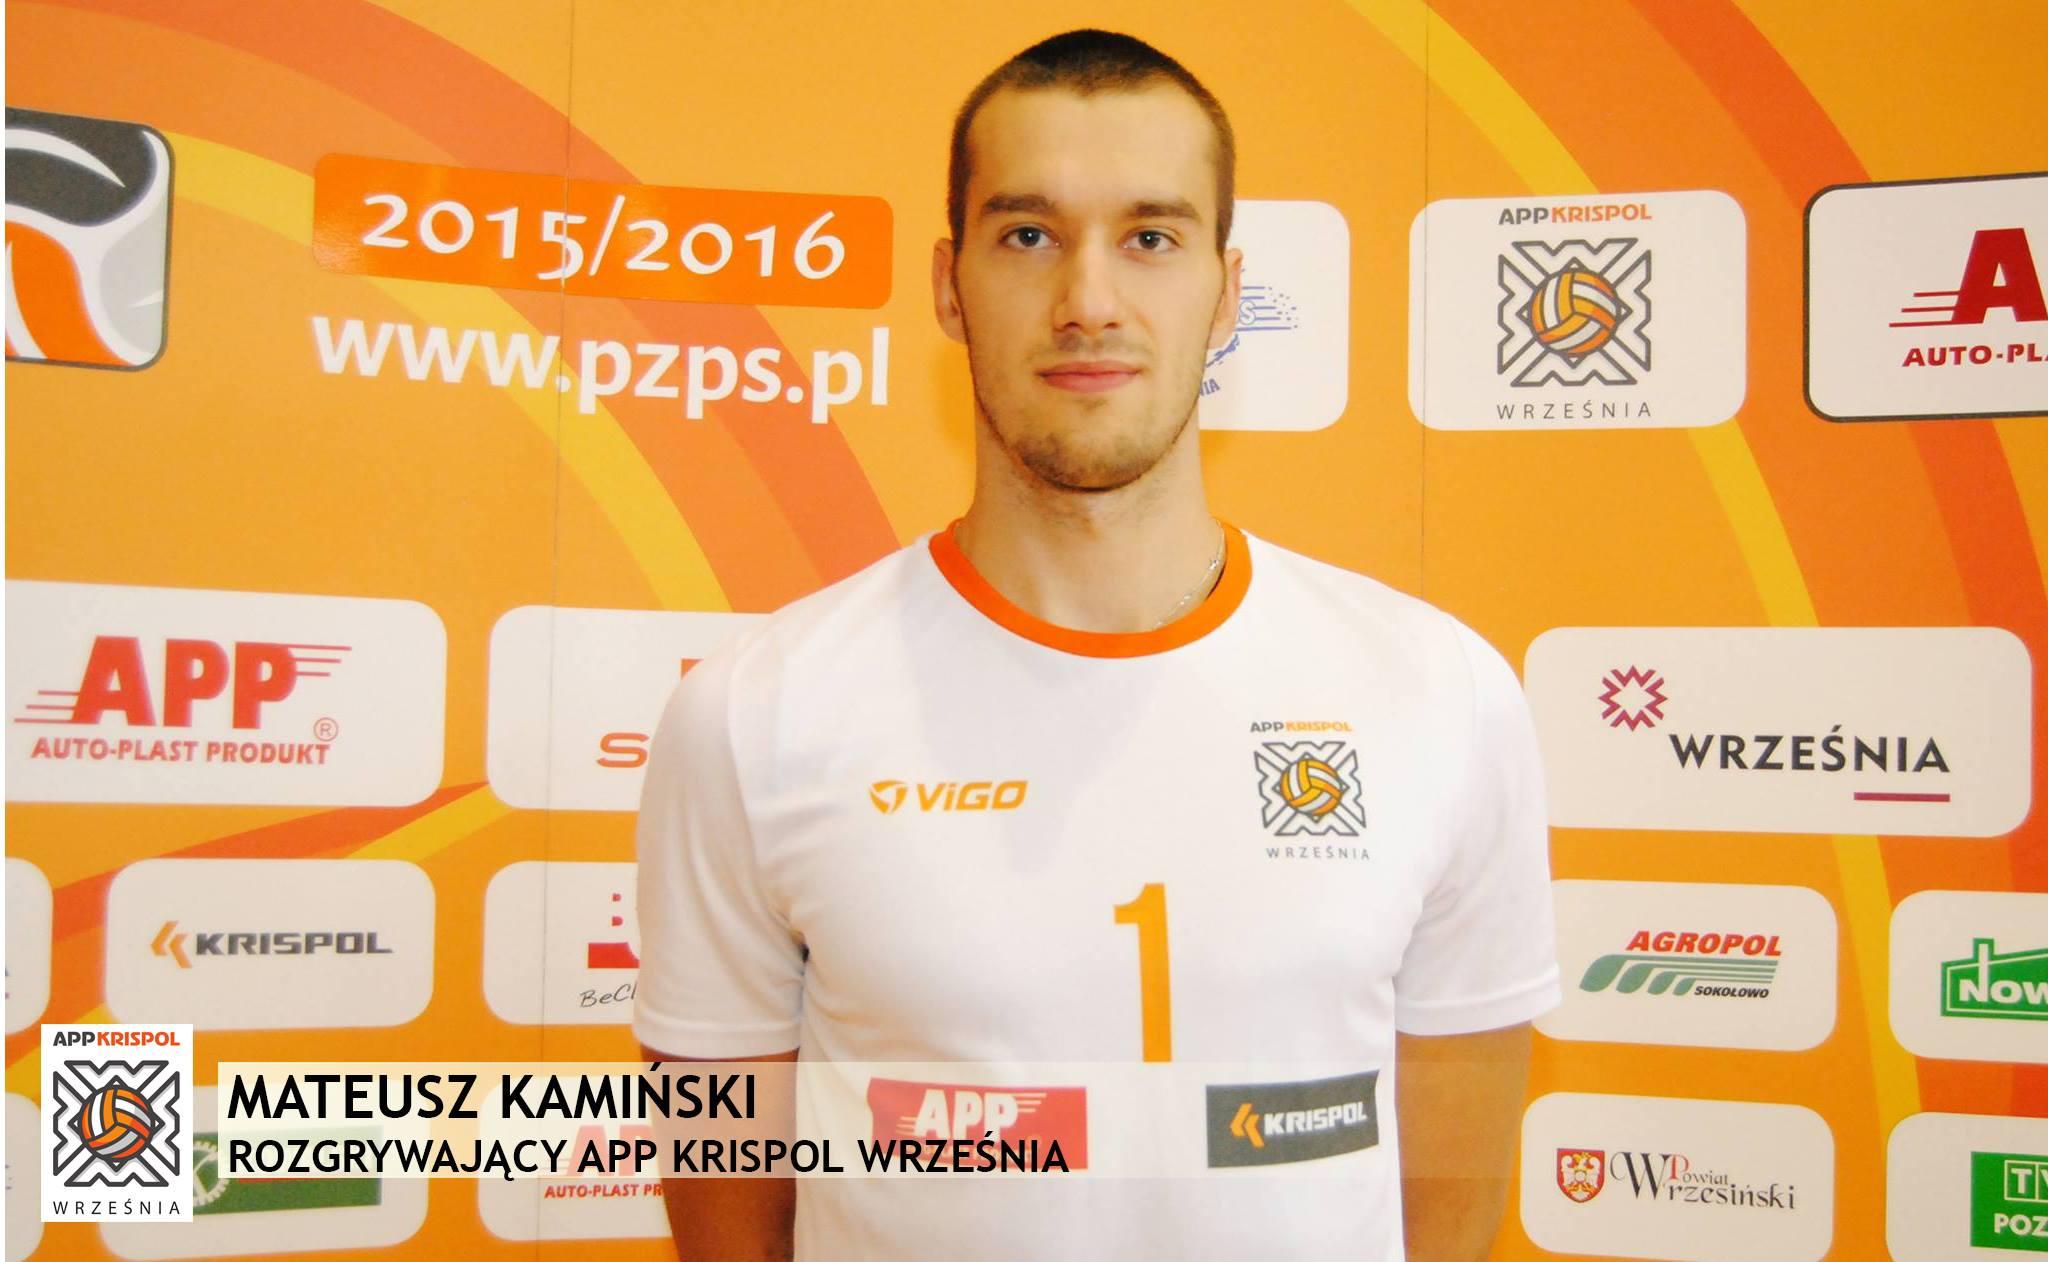 MateuszKaminski